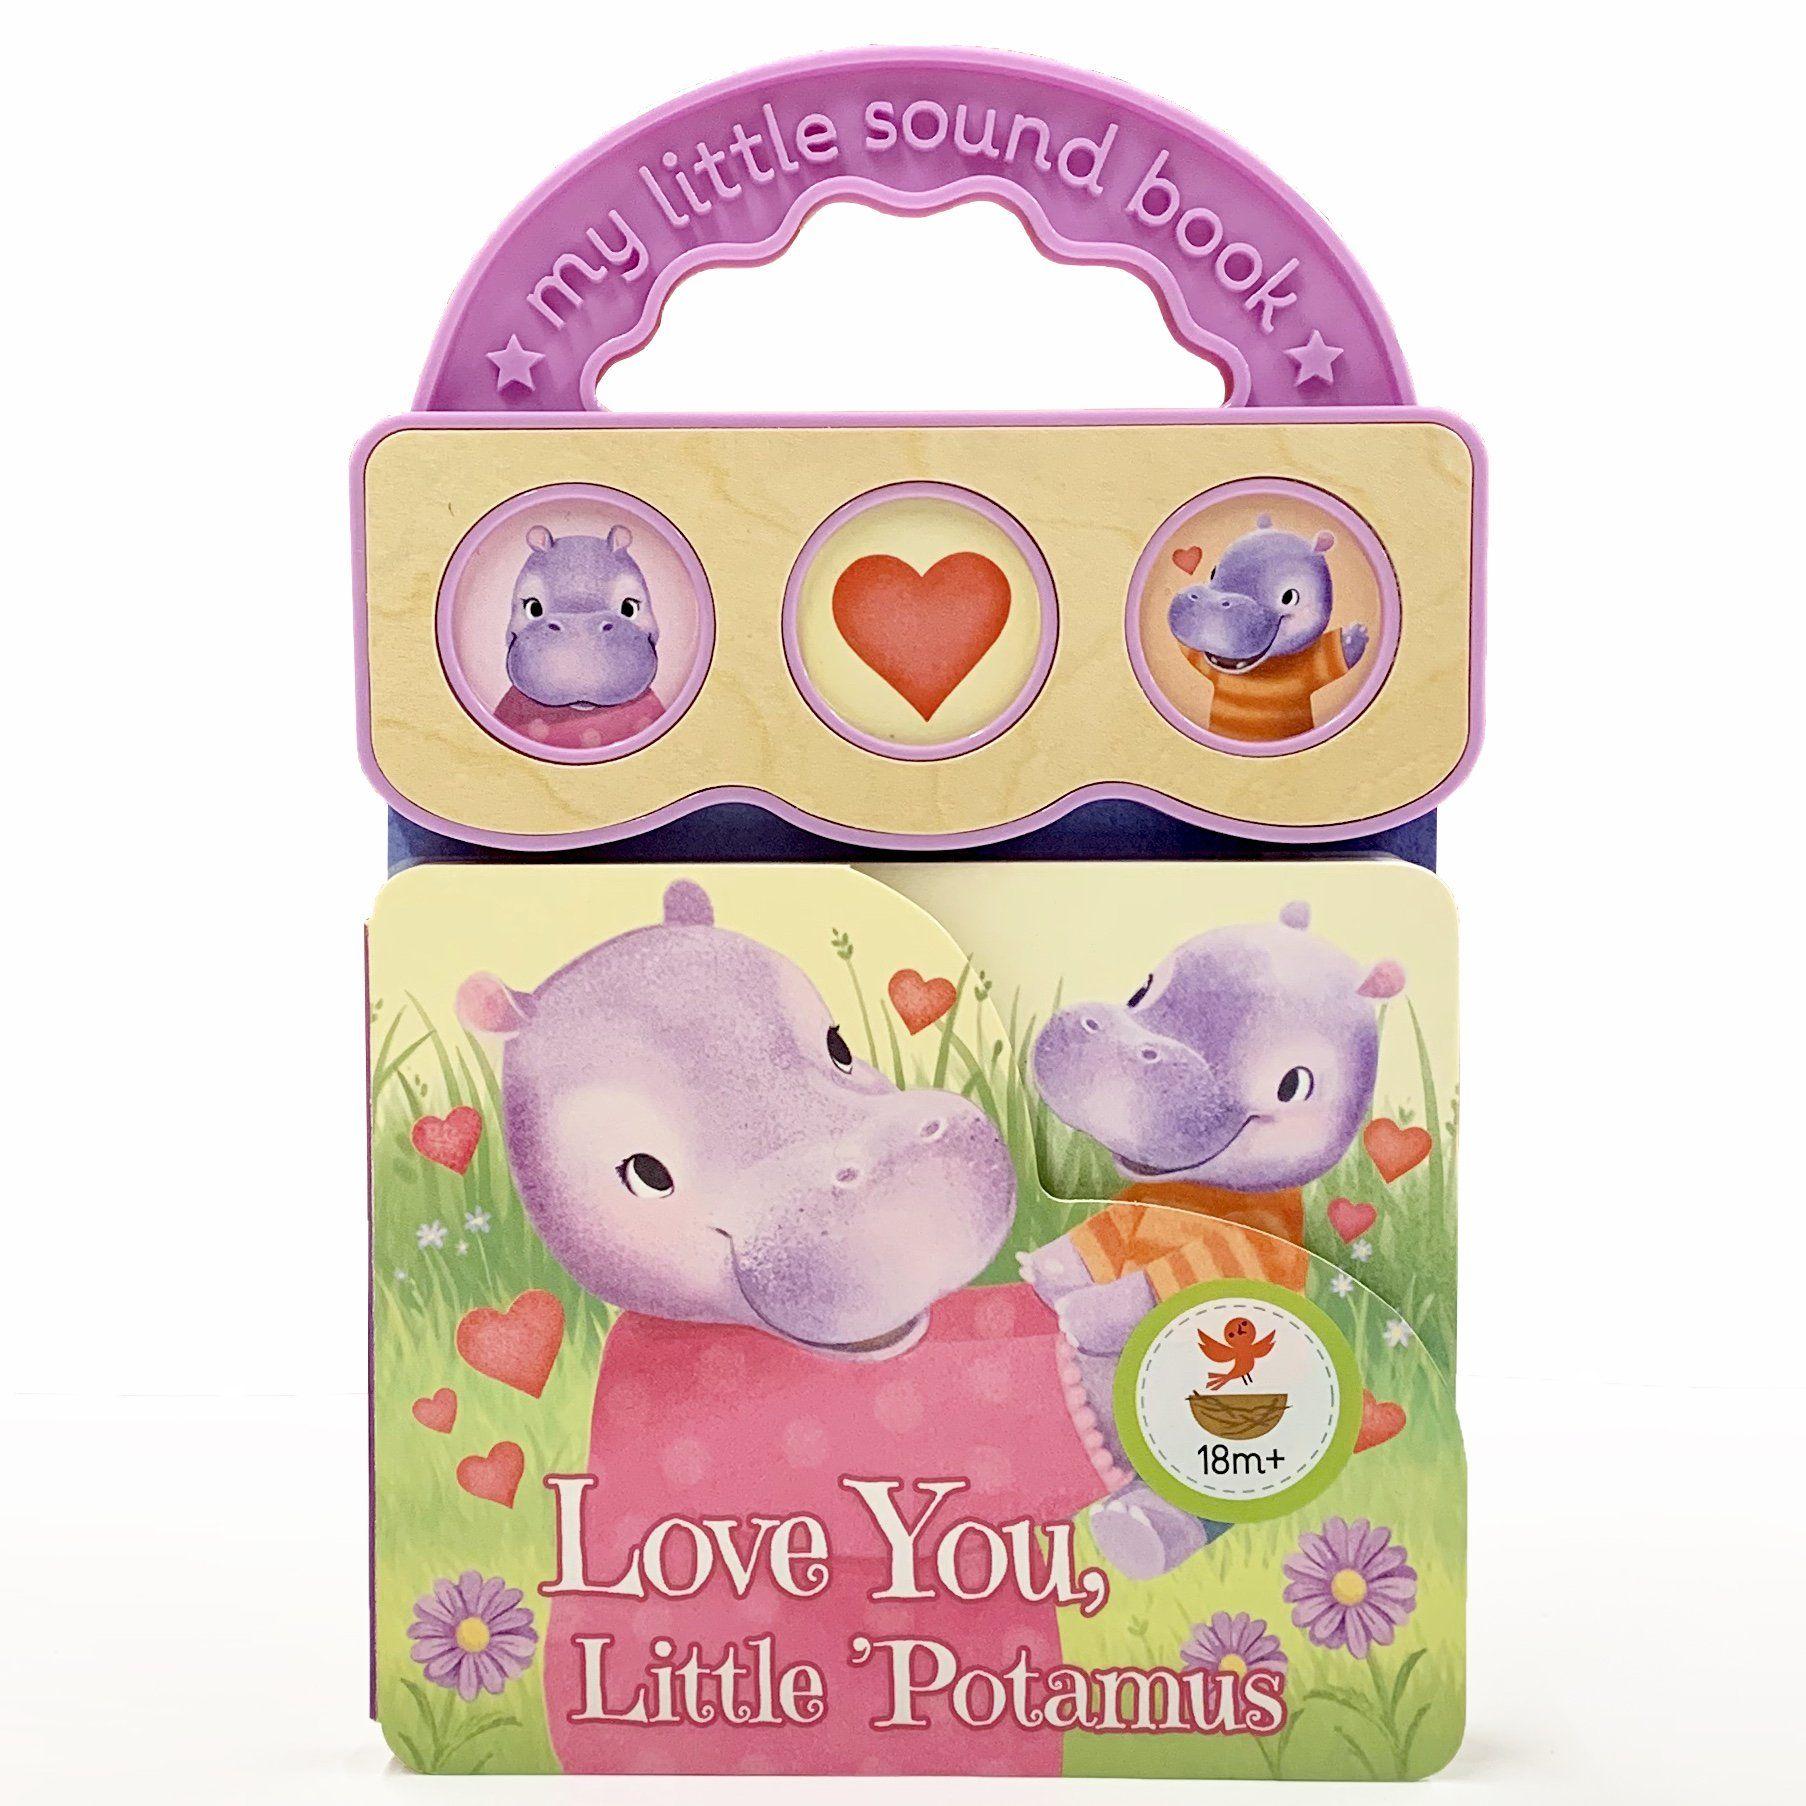 Love You Little Potamus Sing Smile Picture Icon Press The